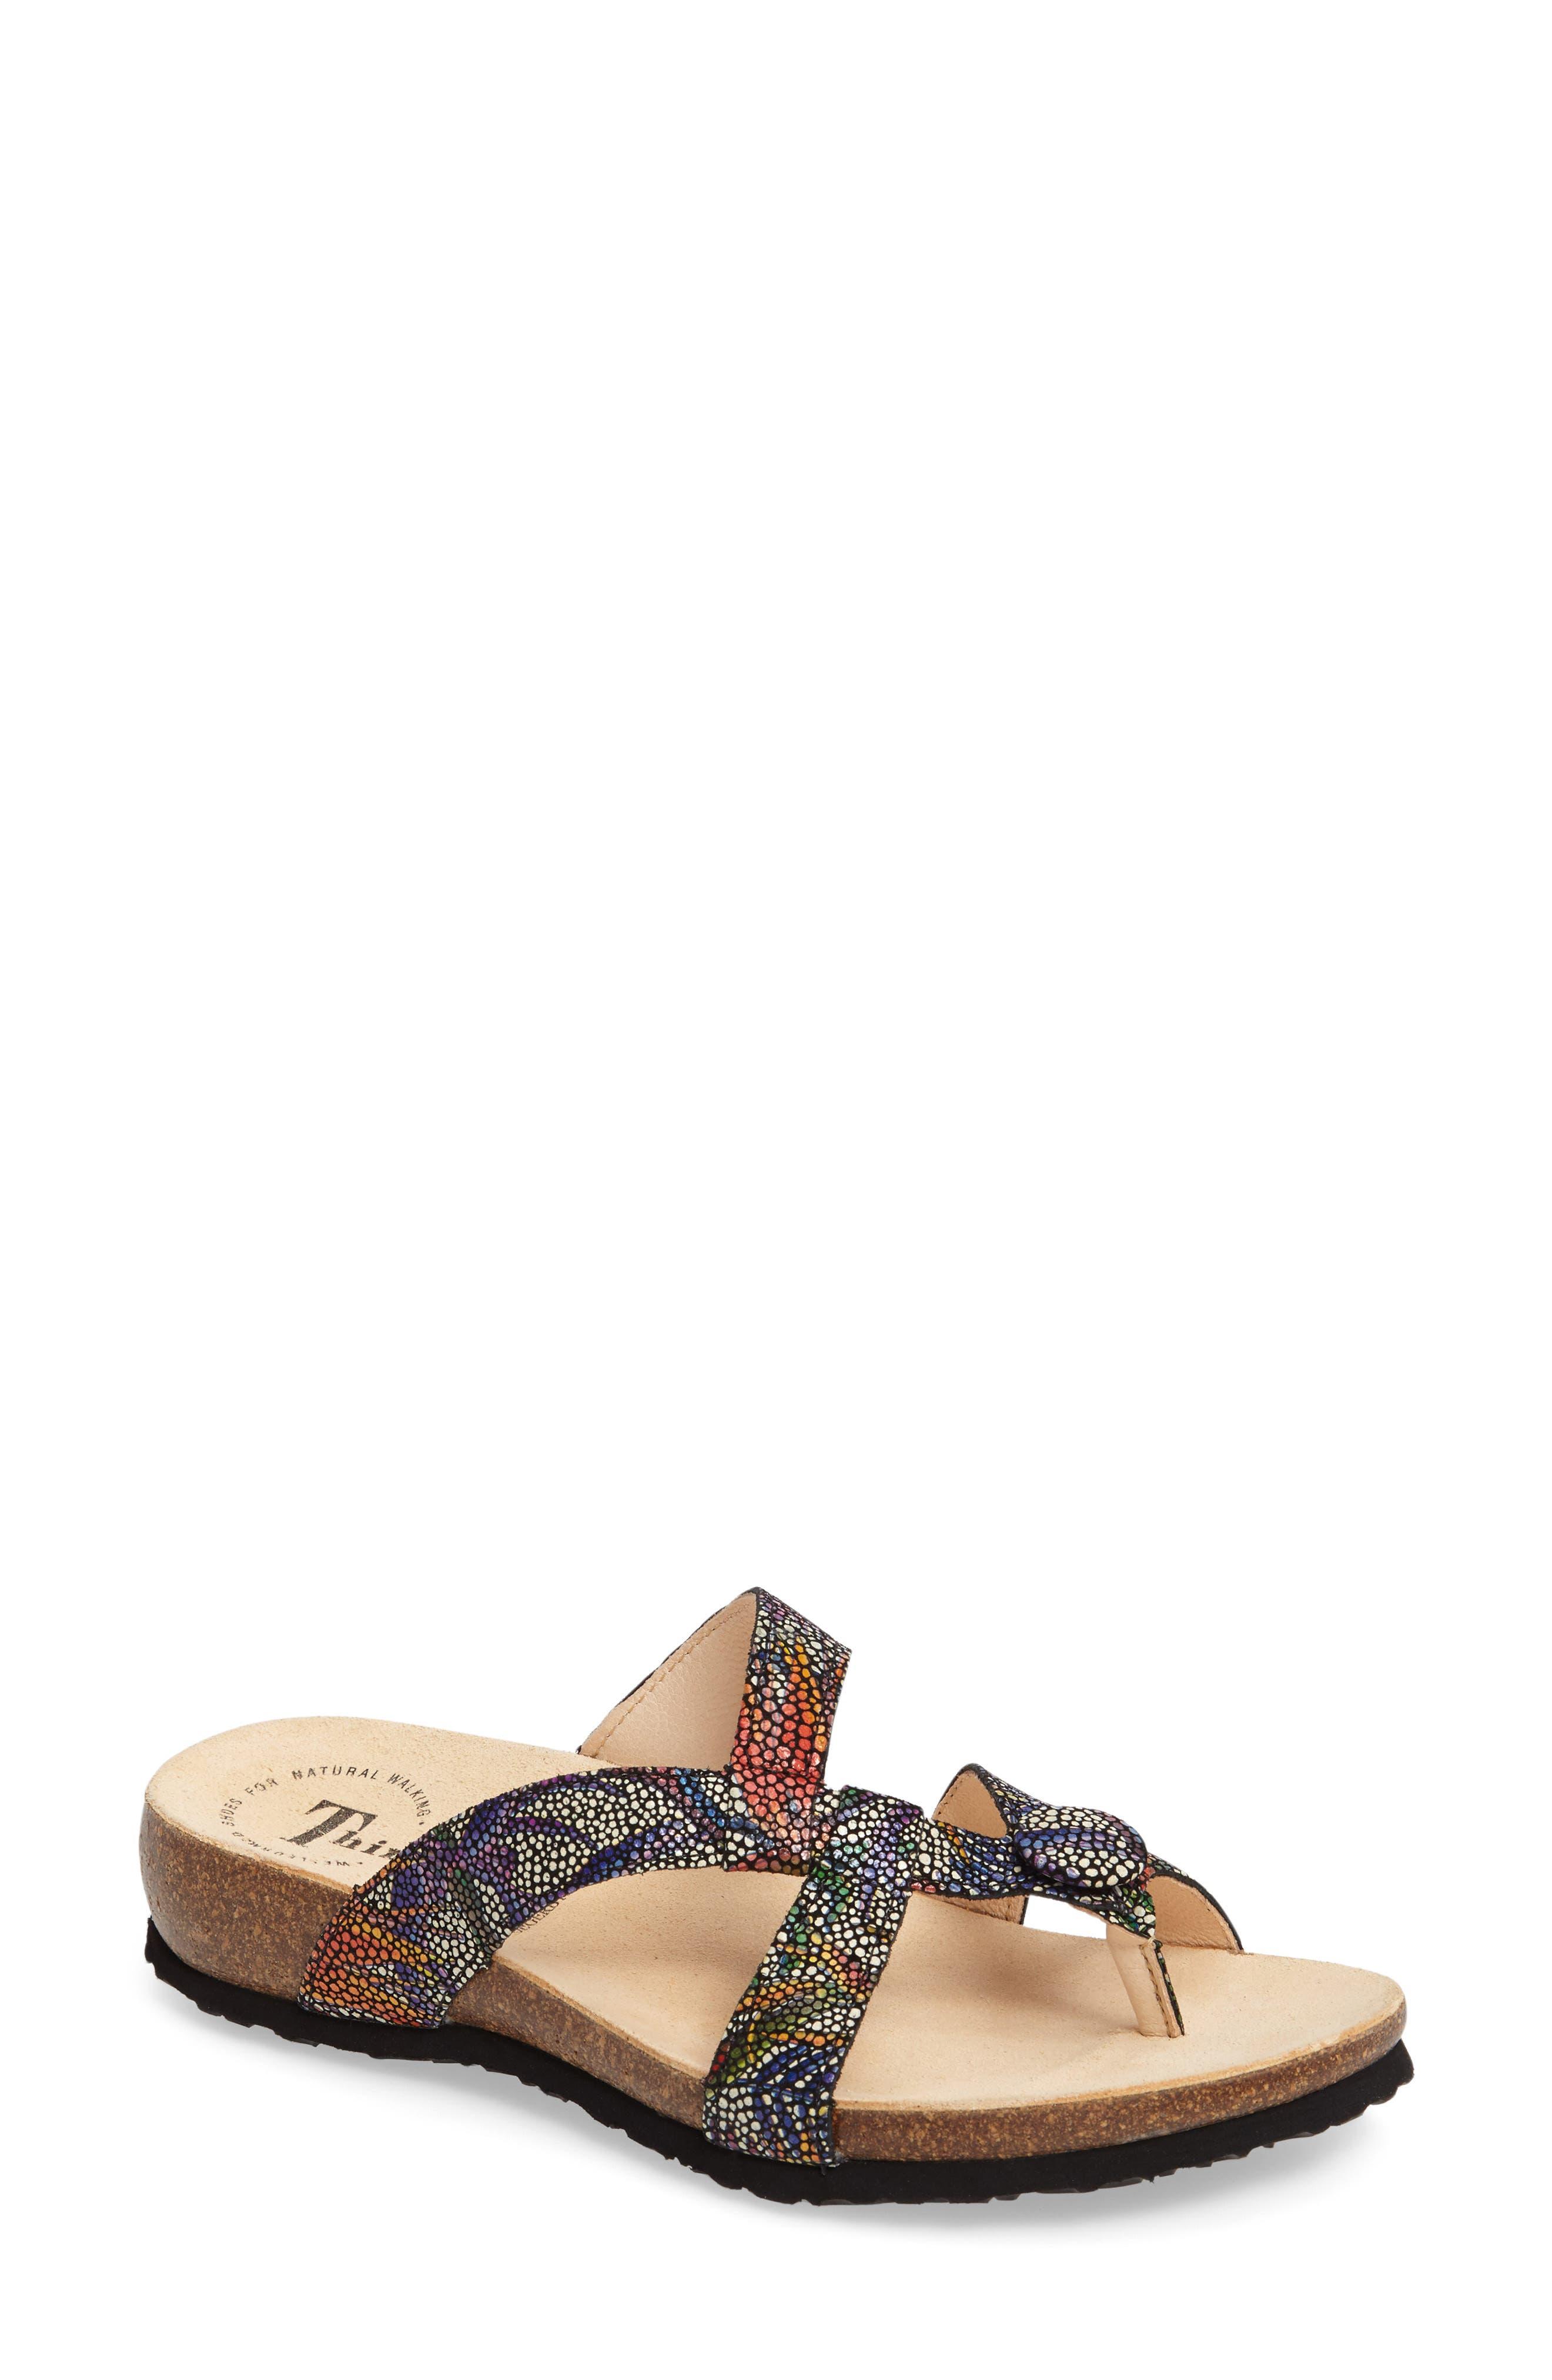 THINK! 'Julia Strappy' Sandal, Main, color, BLACK NUBUCK LEATHER